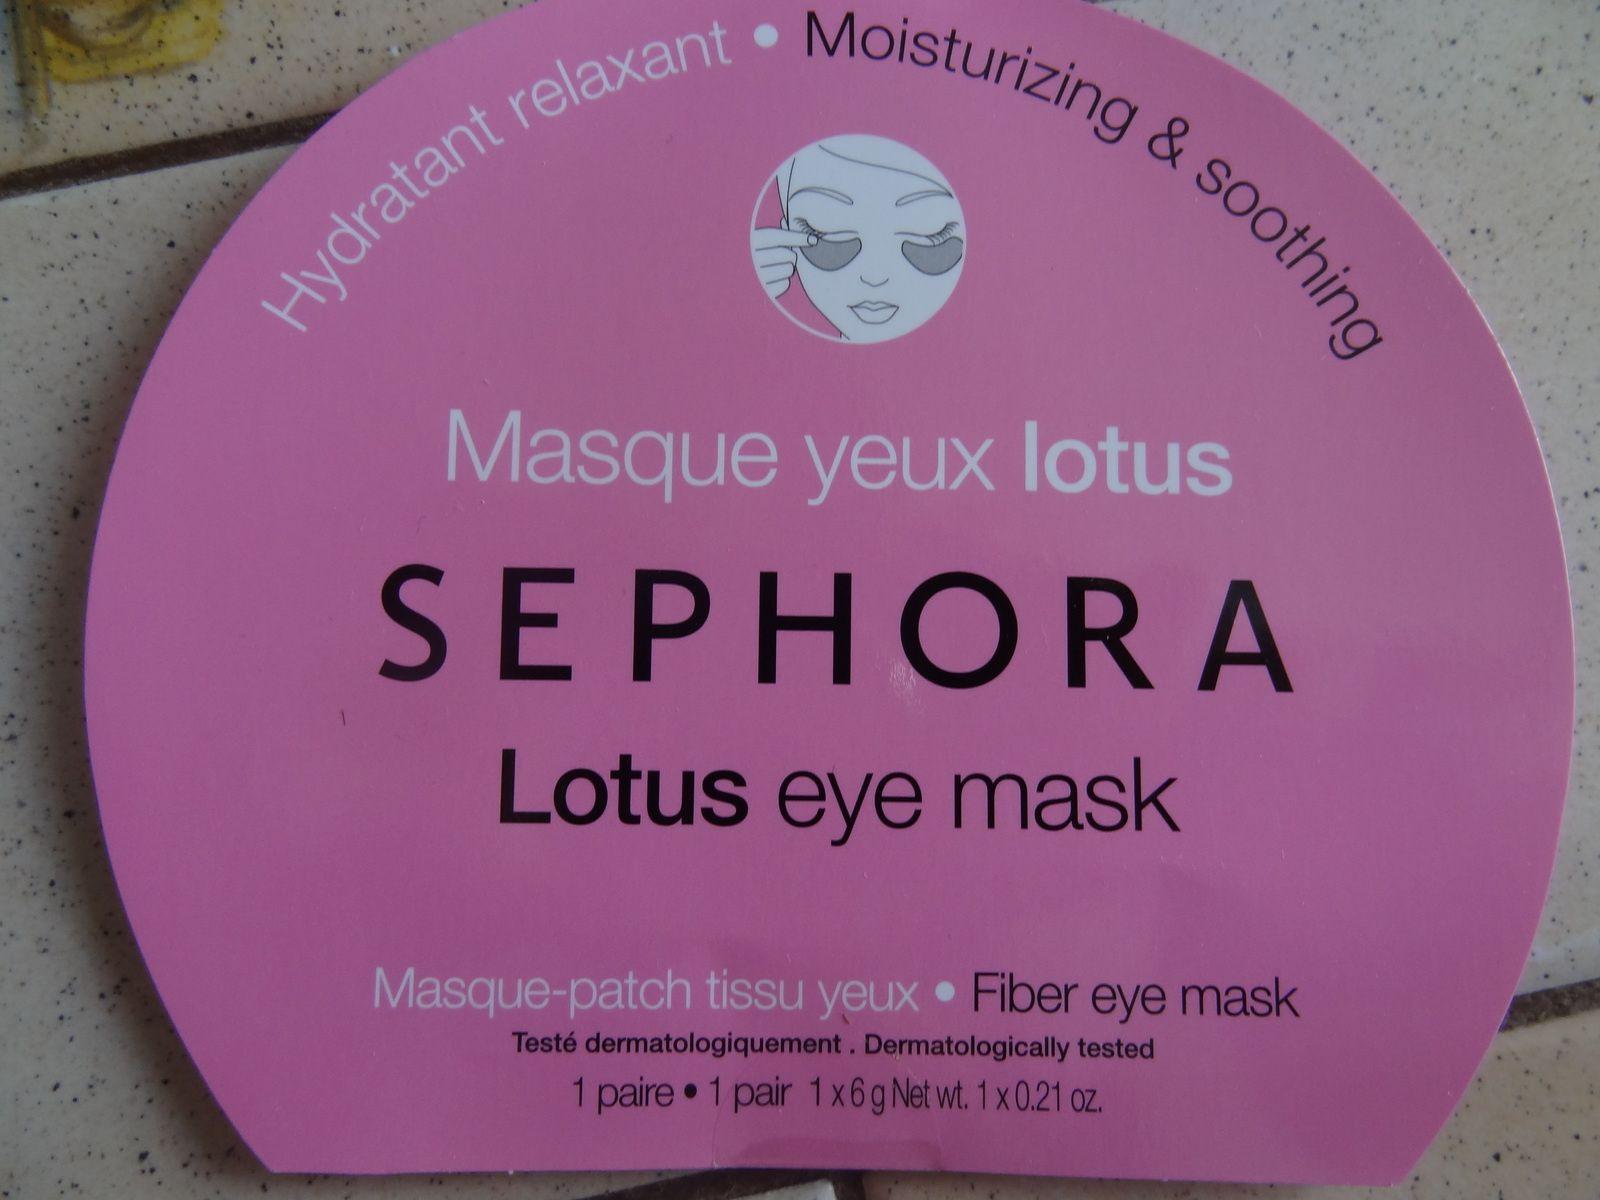 Masque yeux Lotus - Sephora